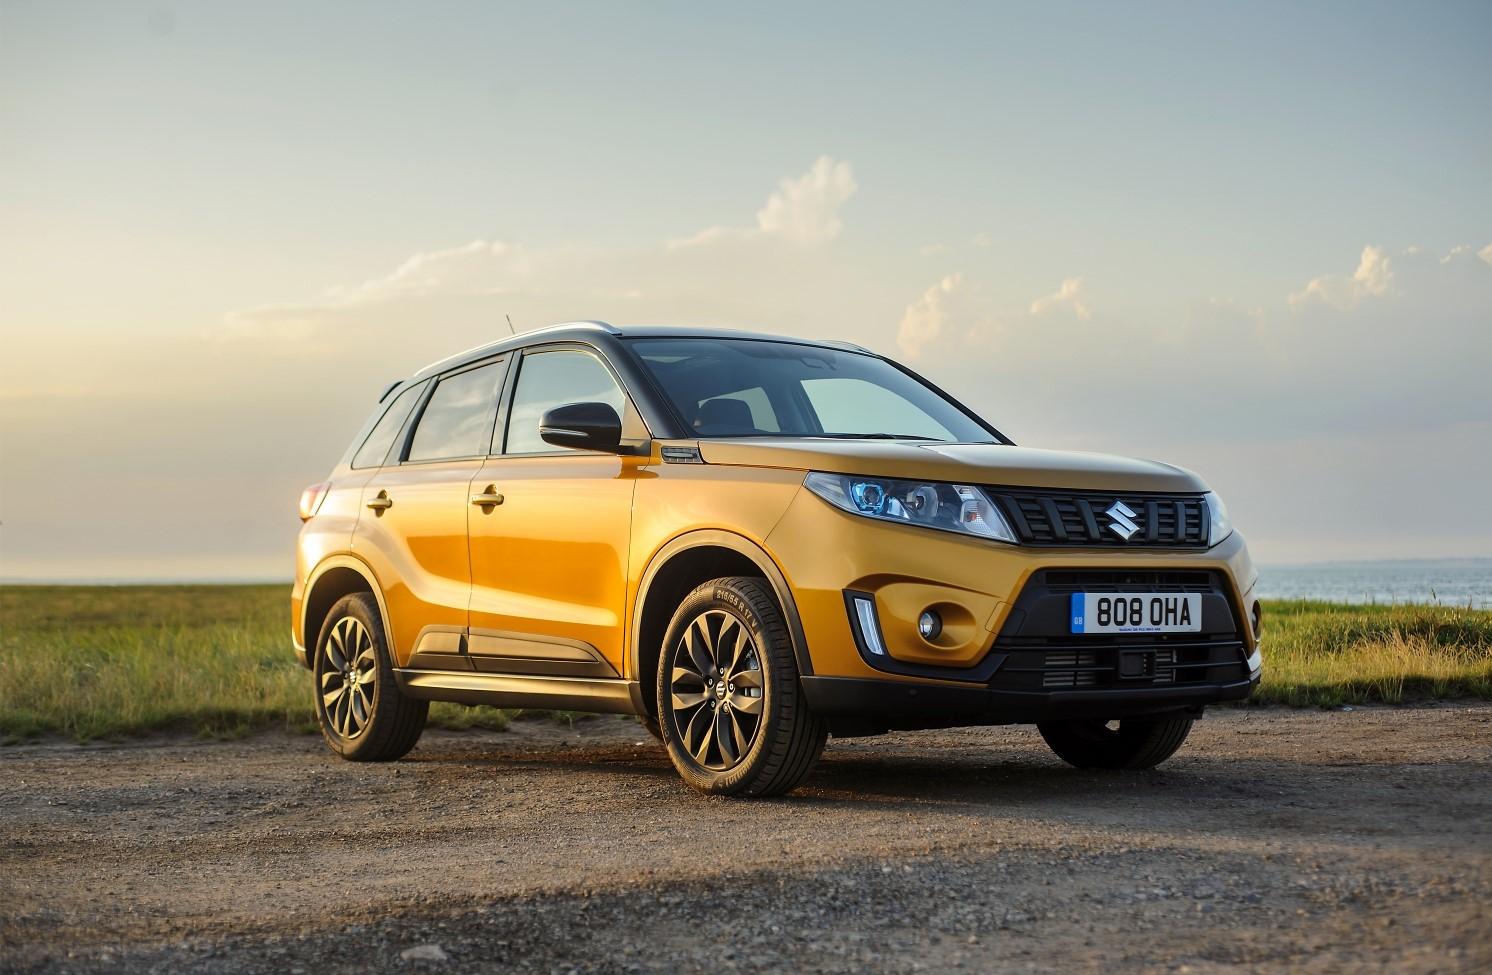 2019 Suzuki Vitara gold side